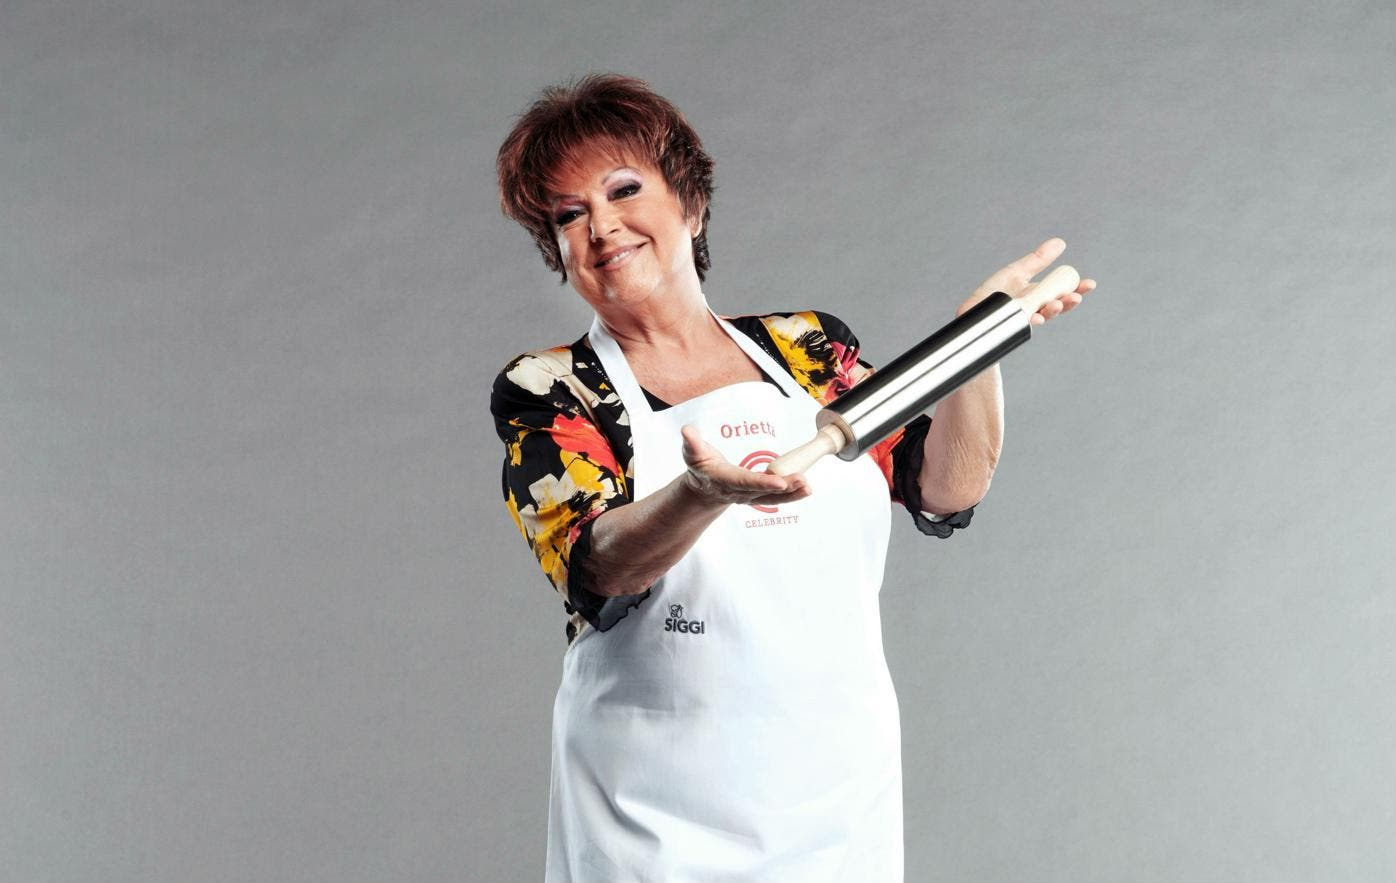 Celebrity MasterChef 2 - Orietta Berti